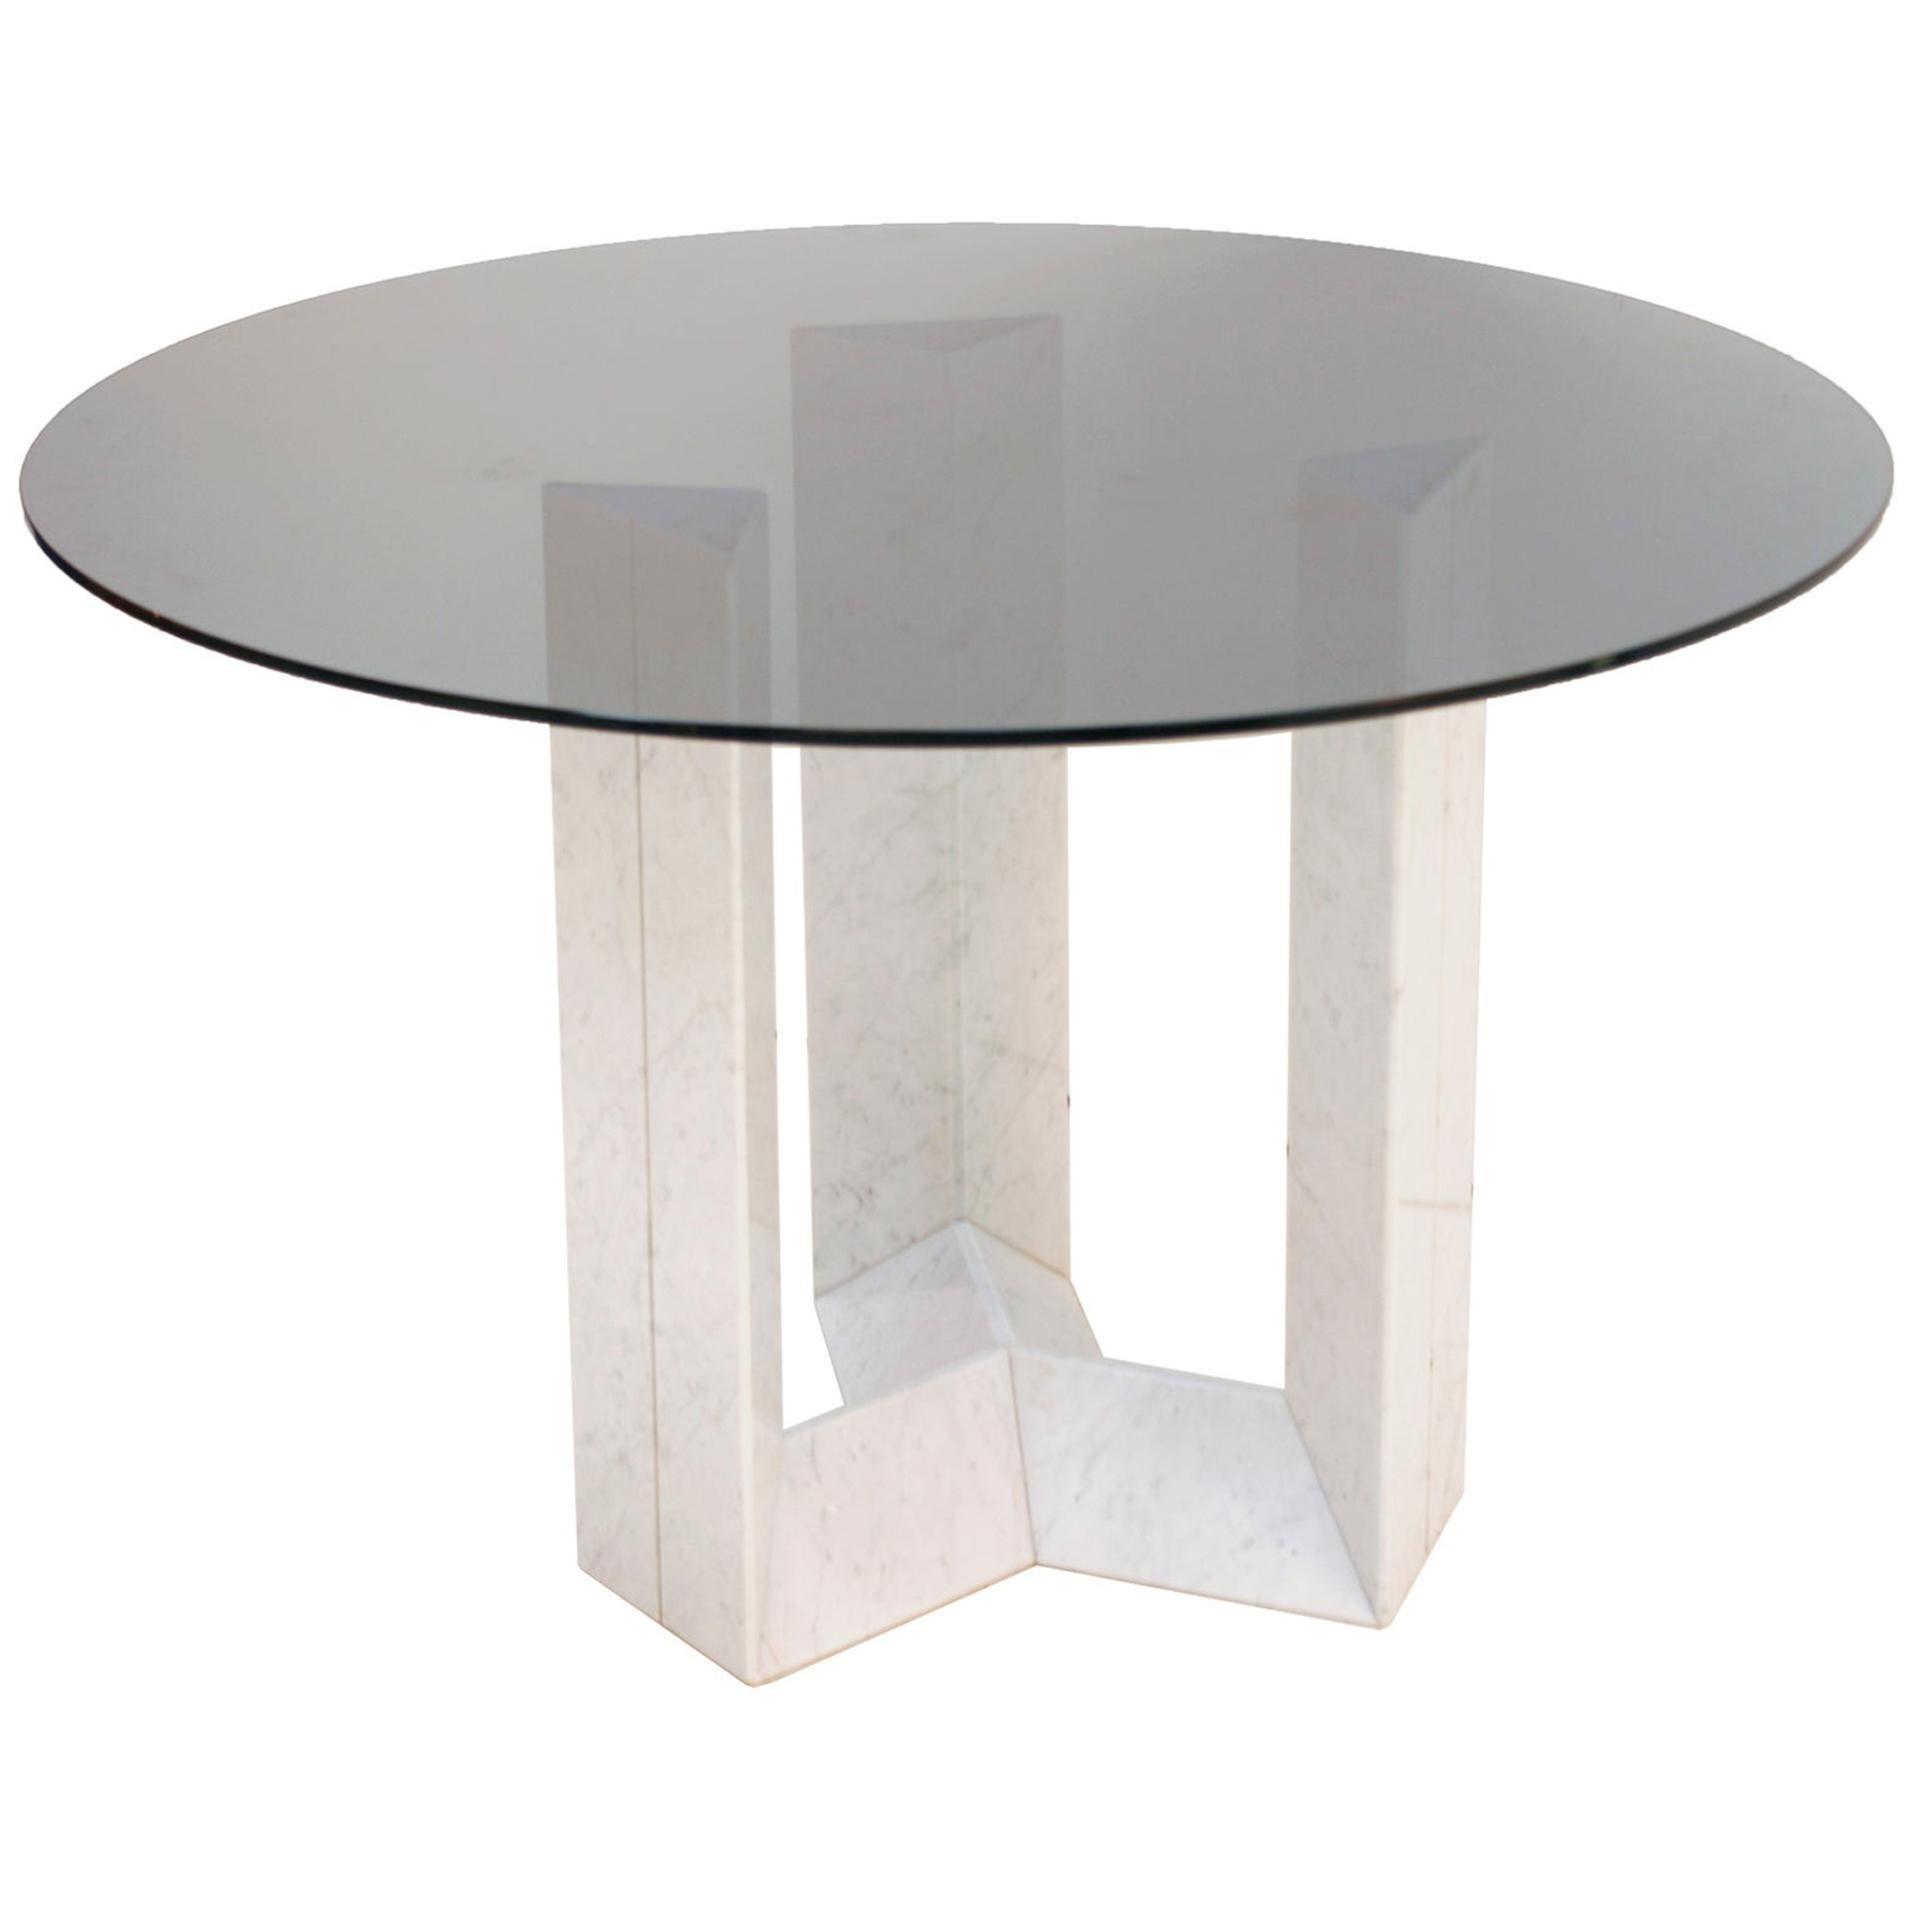 Cattelan Italia Carrara Marble and Smoked Glass Italian Table